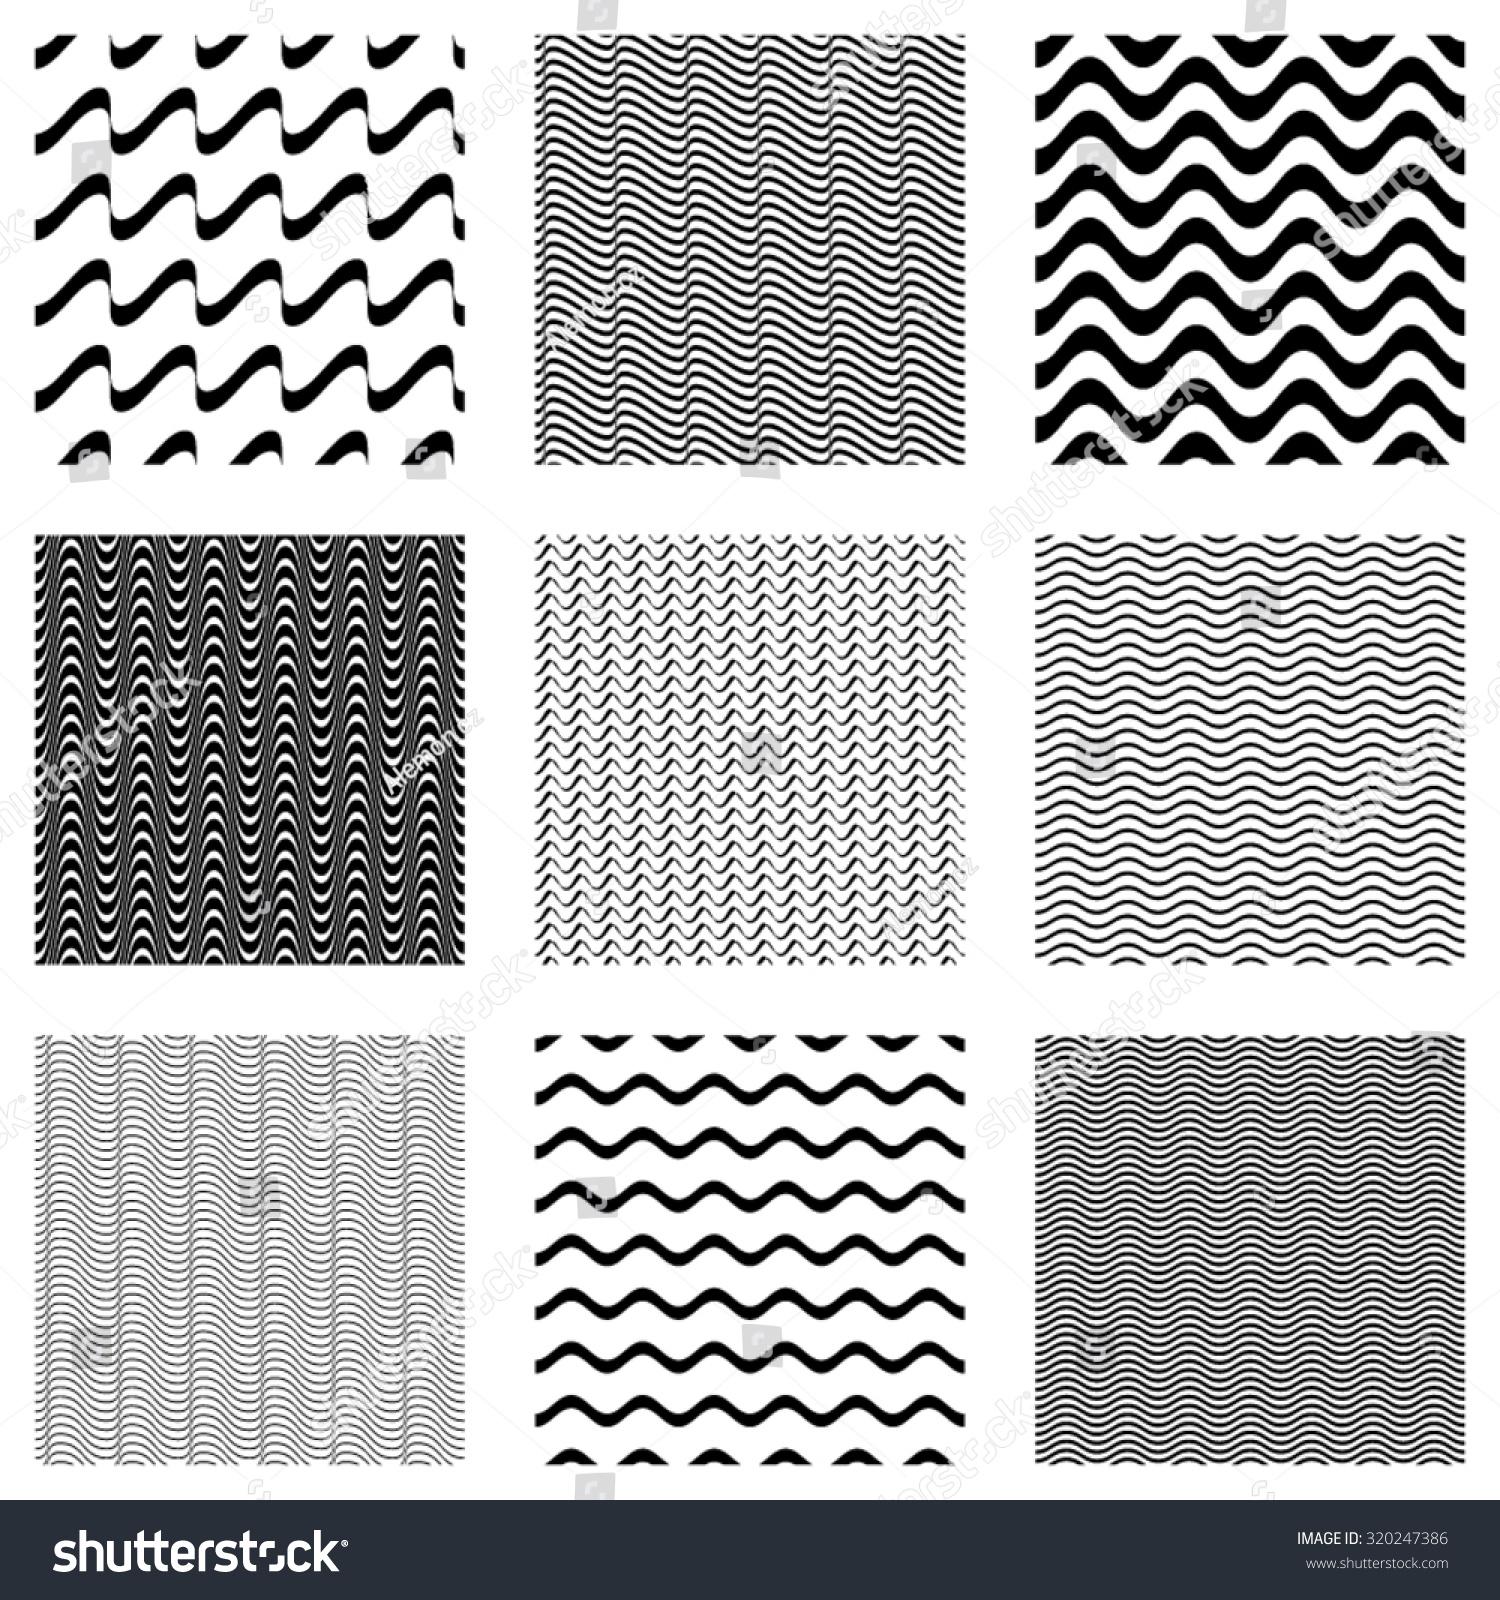 Simple Line Designs Patterns : Black vector simple seamless wavy line stock